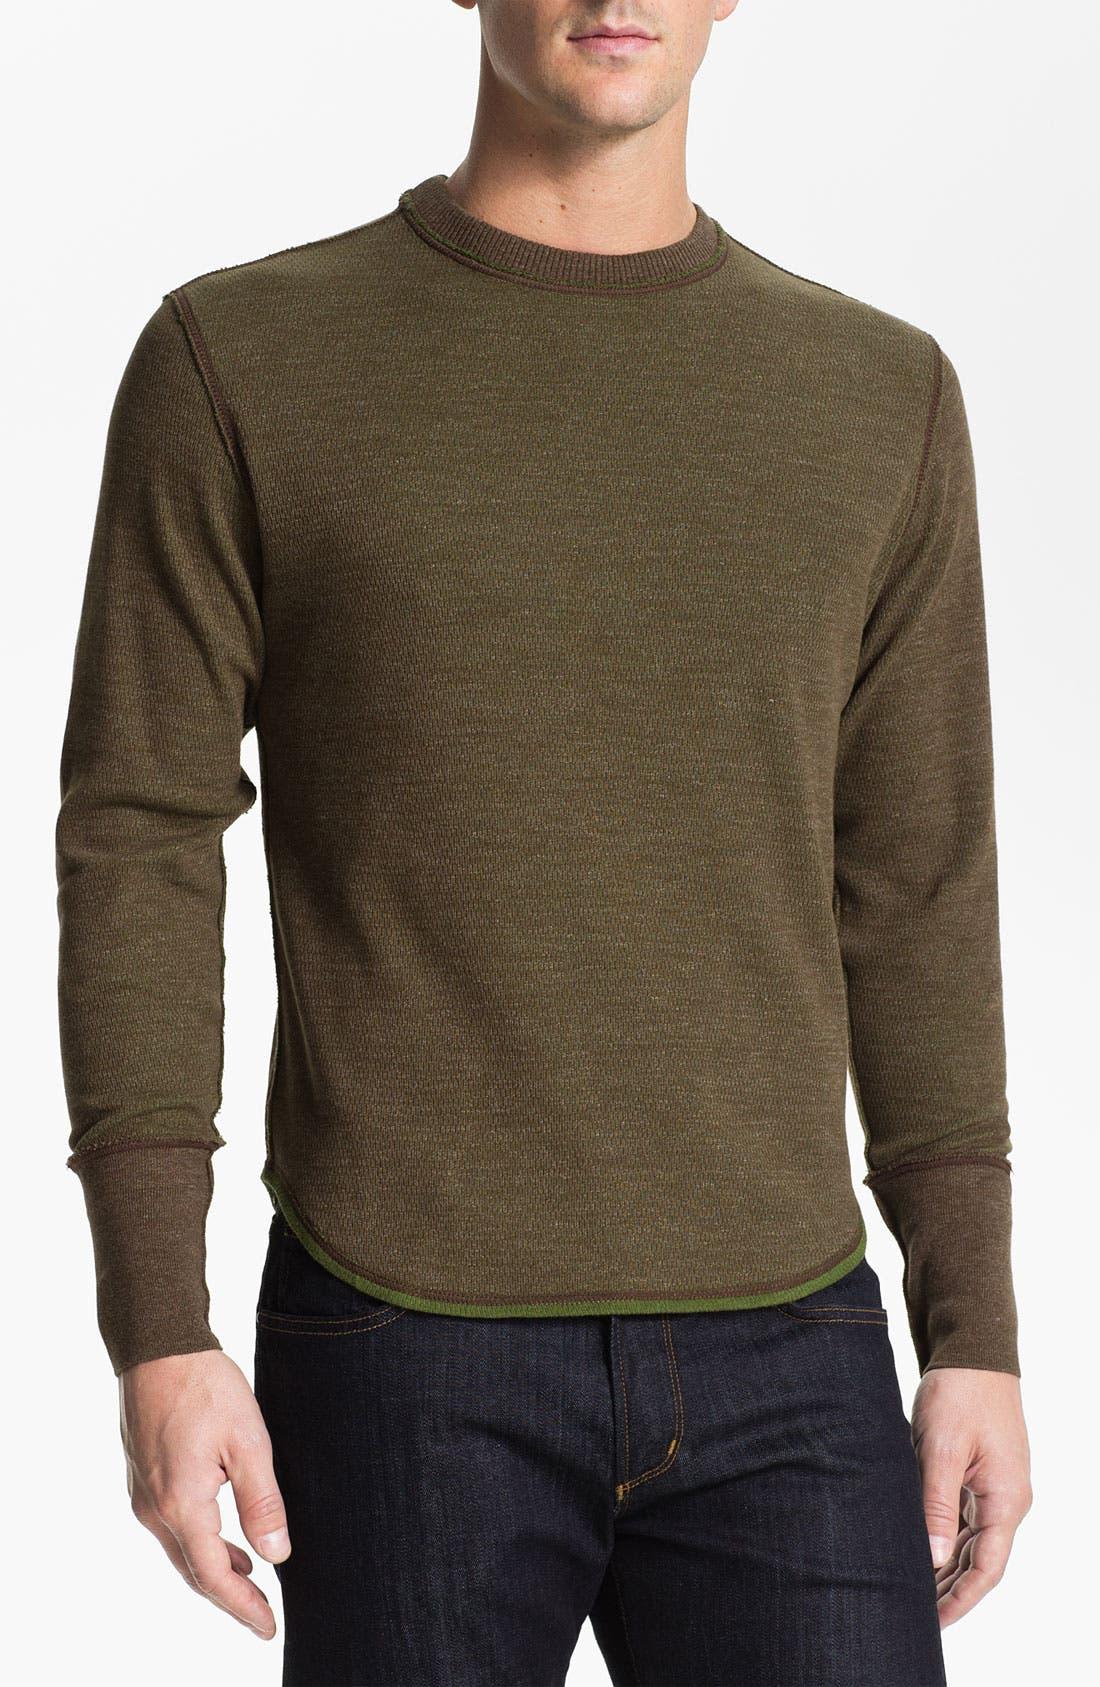 Main Image - Robert Graham 'Chancel' Reversible Thermal T-Shirt